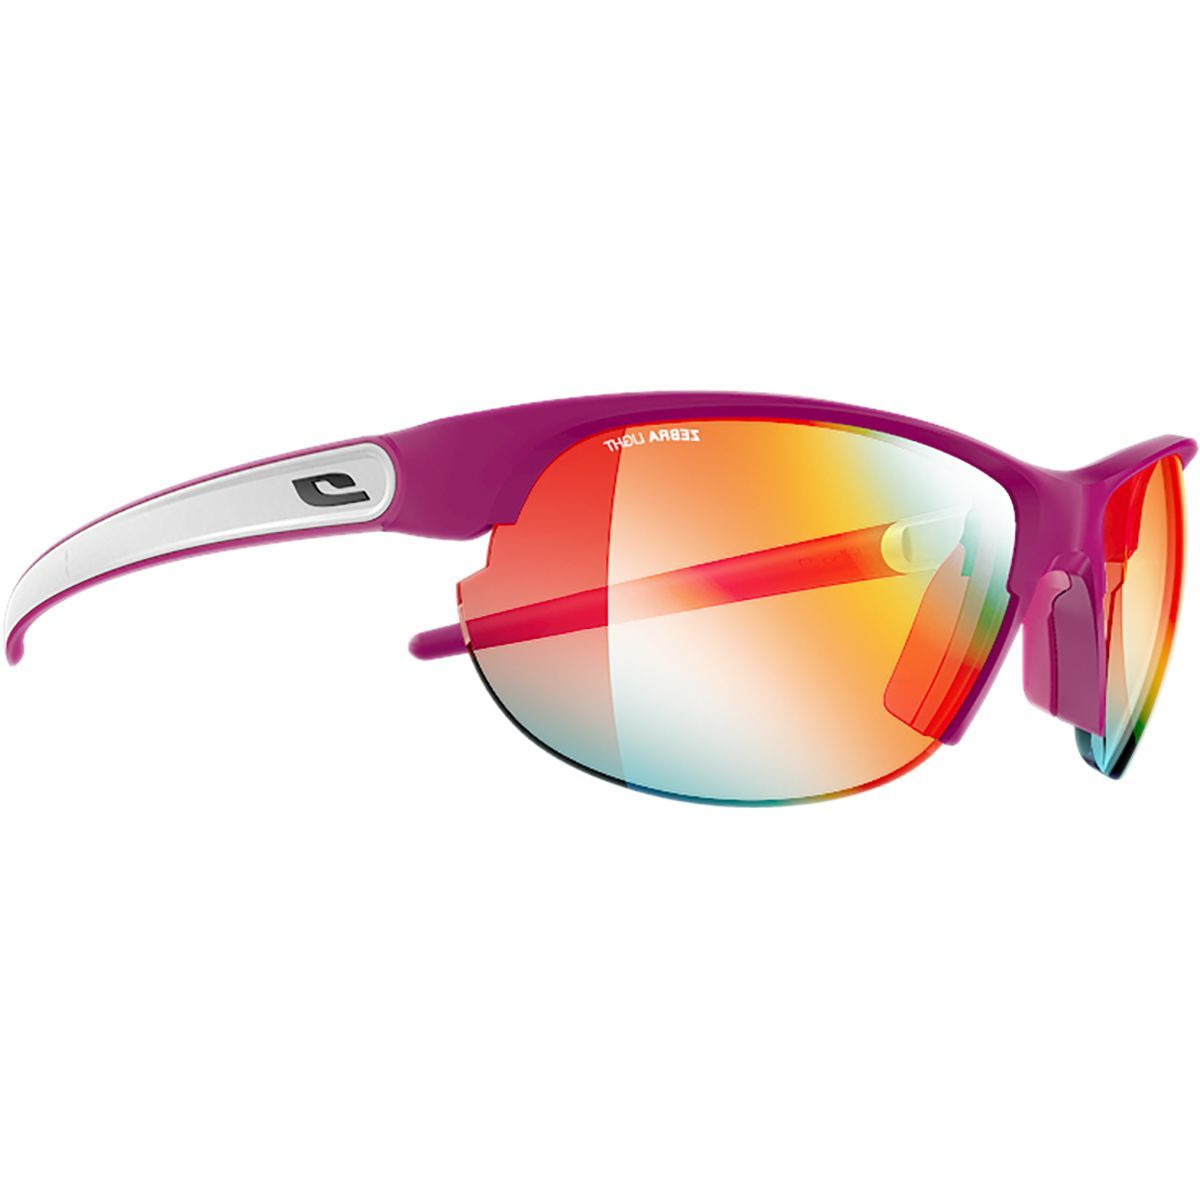 Julbo Breeze Zebra Photochromic Sunglasses - Women's